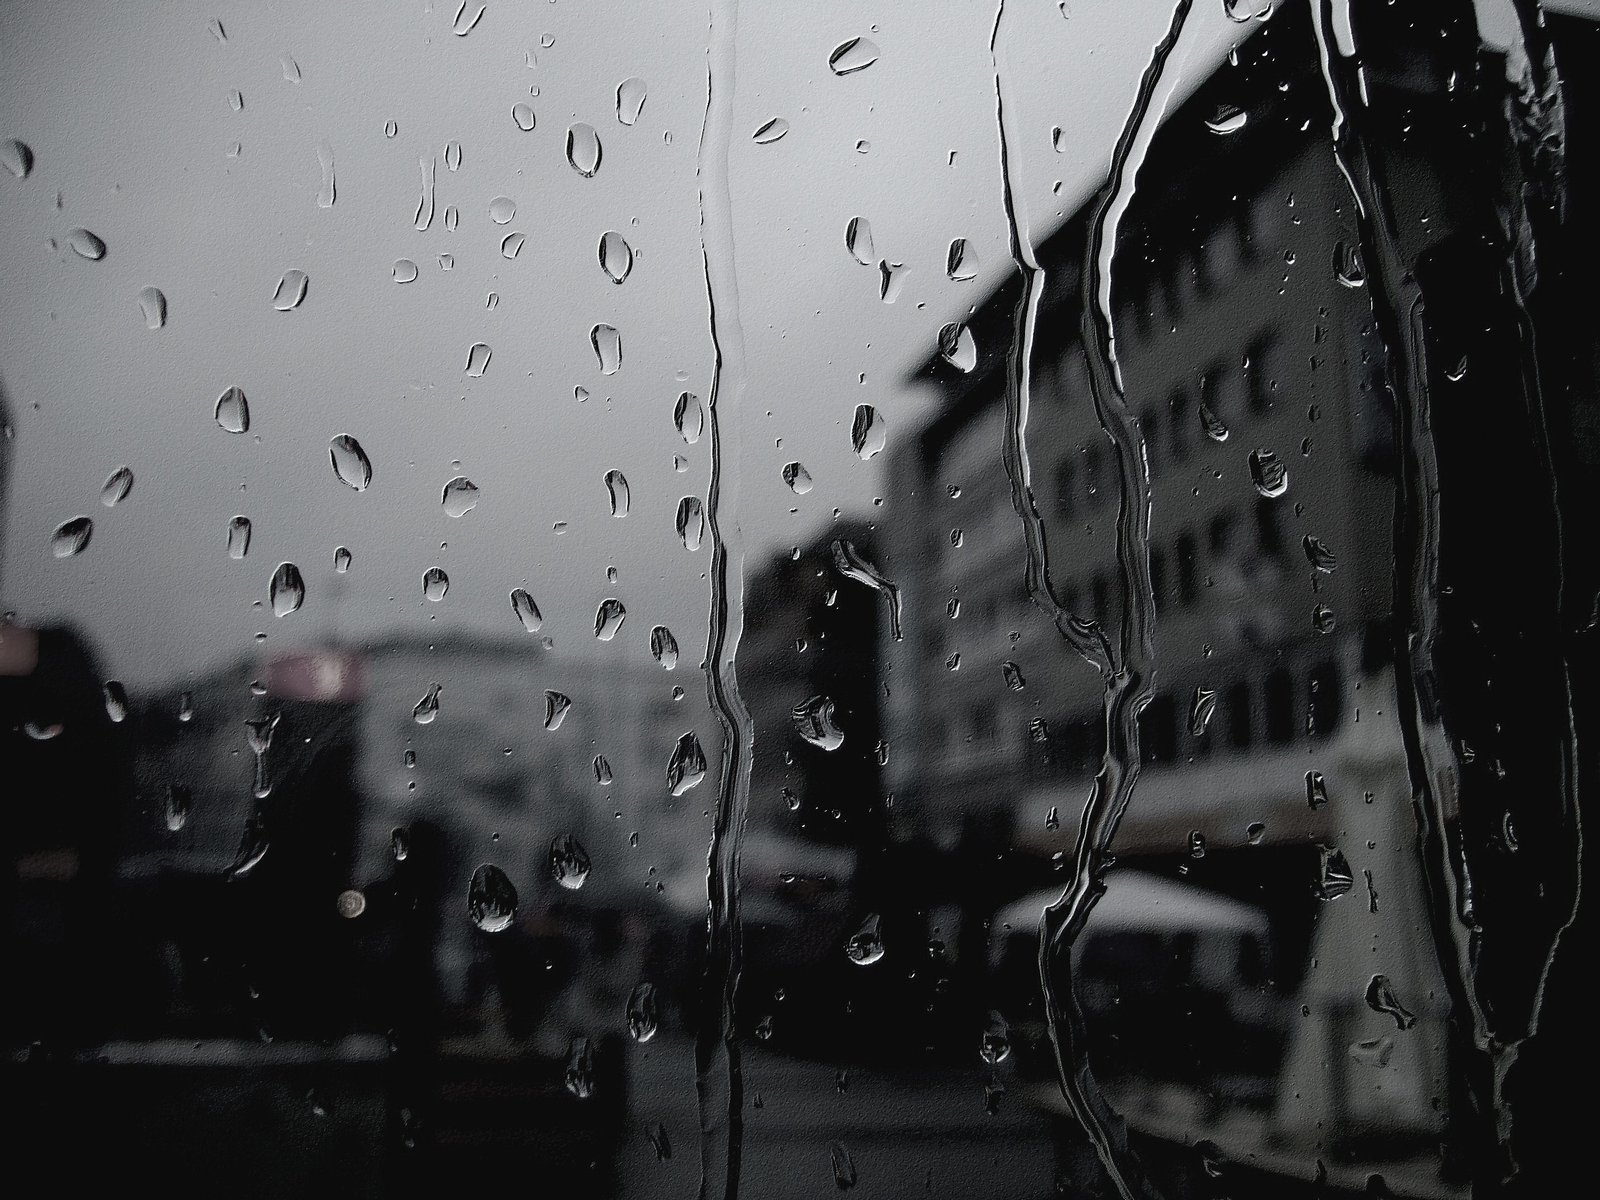 Ploaia - Scoala de soferi Timisoara - KREBS